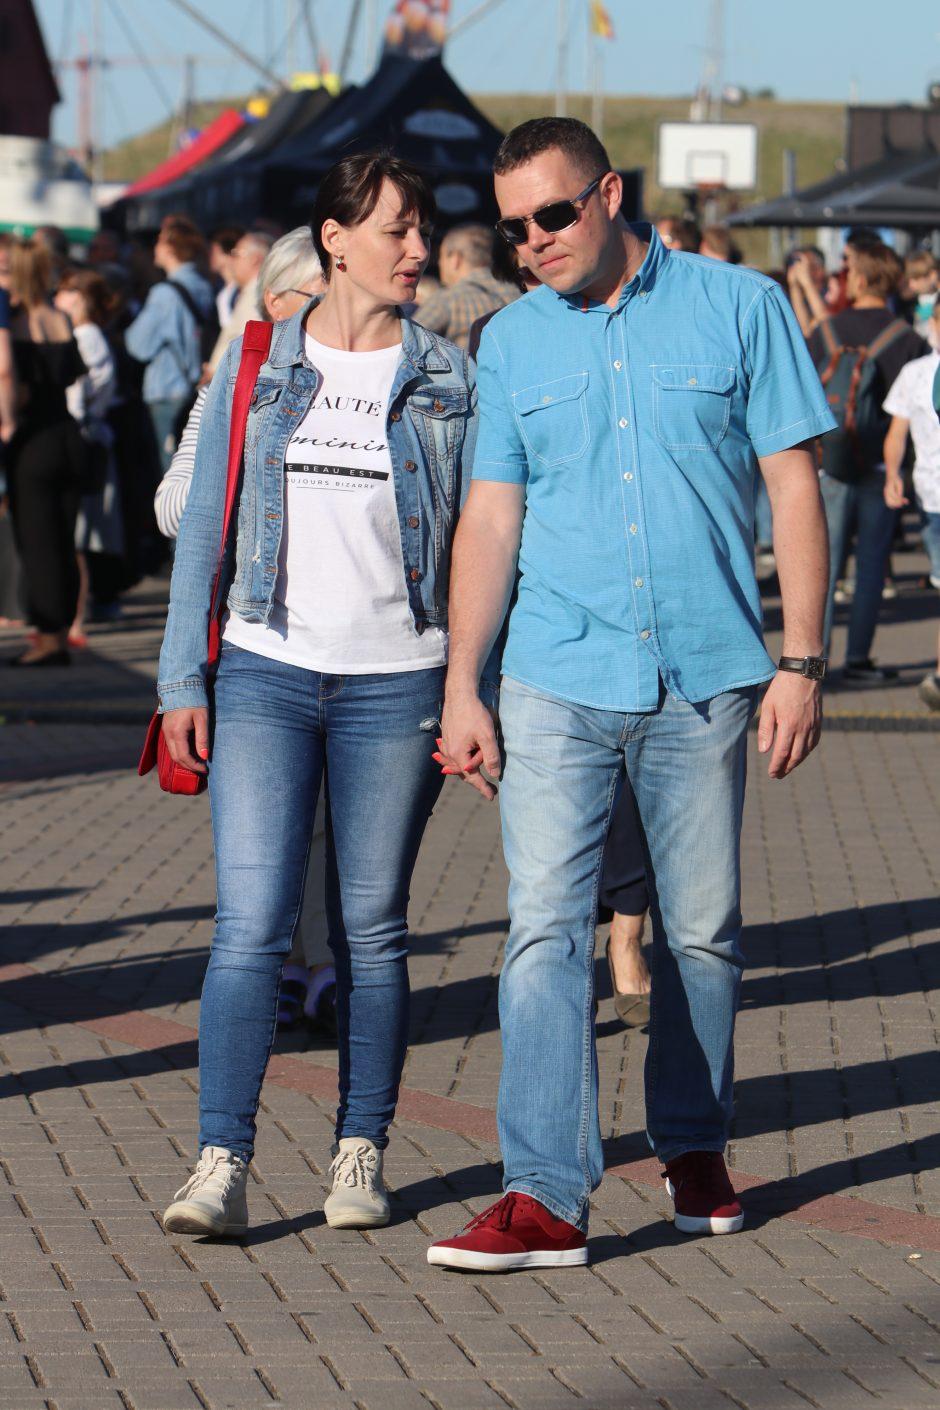 Birželio 14-oji Klaipėdos diena